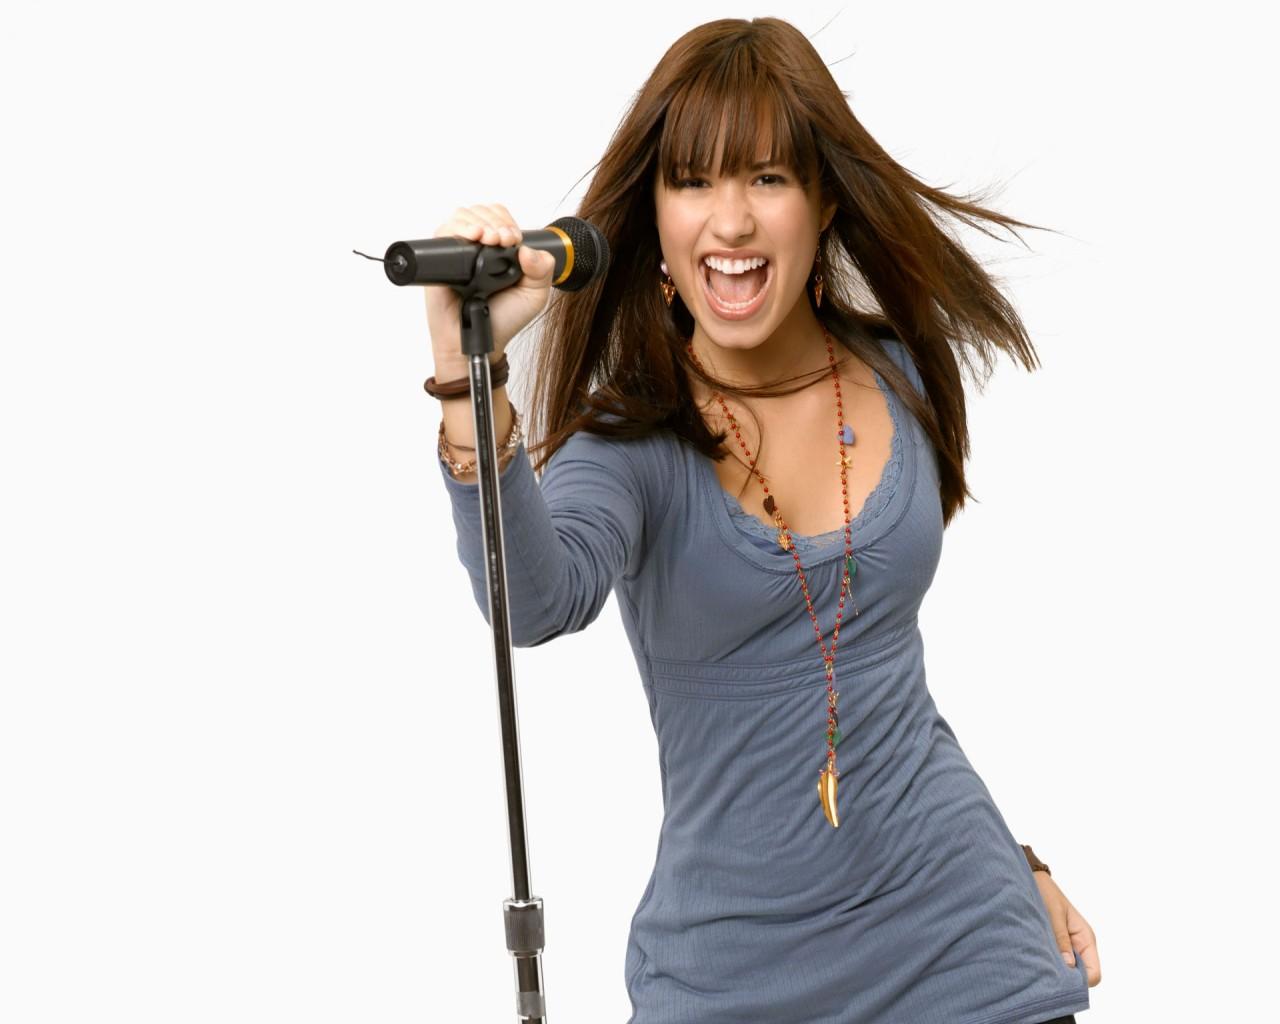 Persona 5 Girls Wallpaper Demi Lovato Singing Wallpapers Hd Wallpapers Id 6341